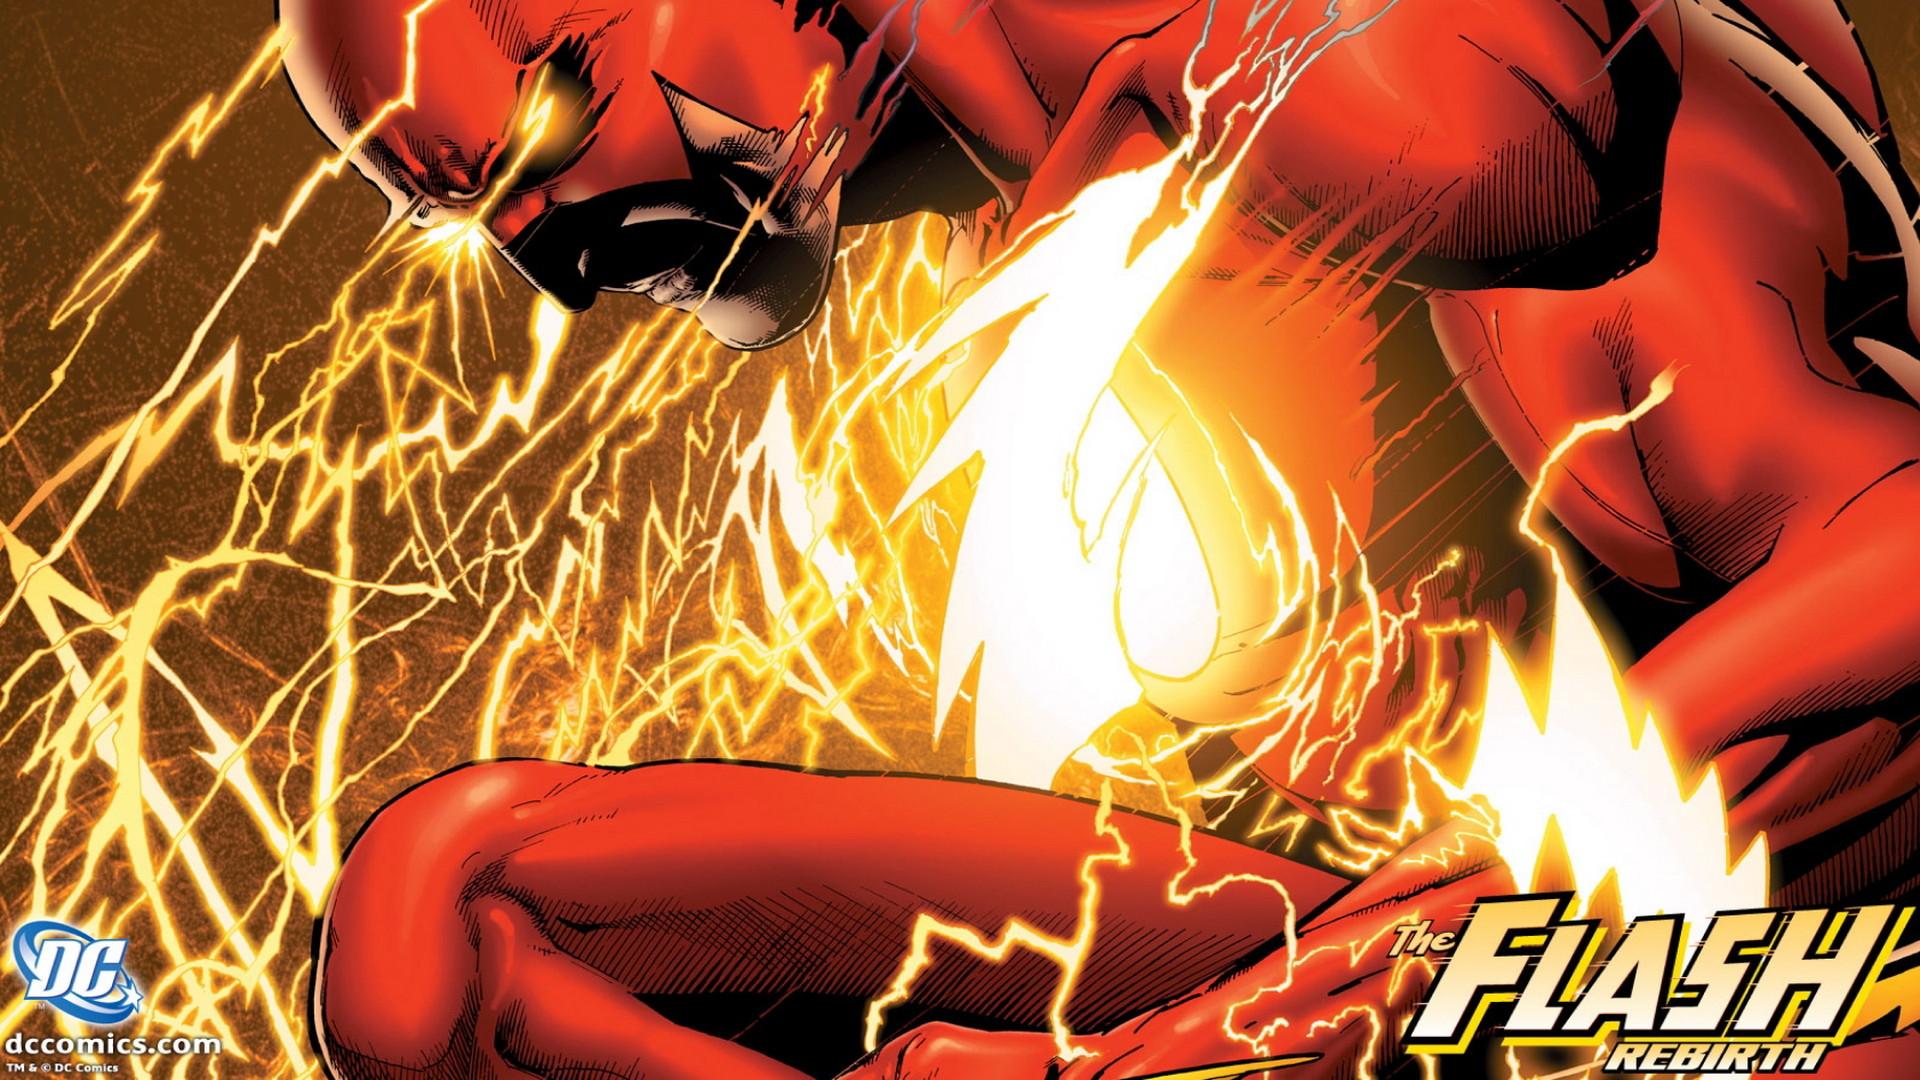 The Flash Gains Momentum